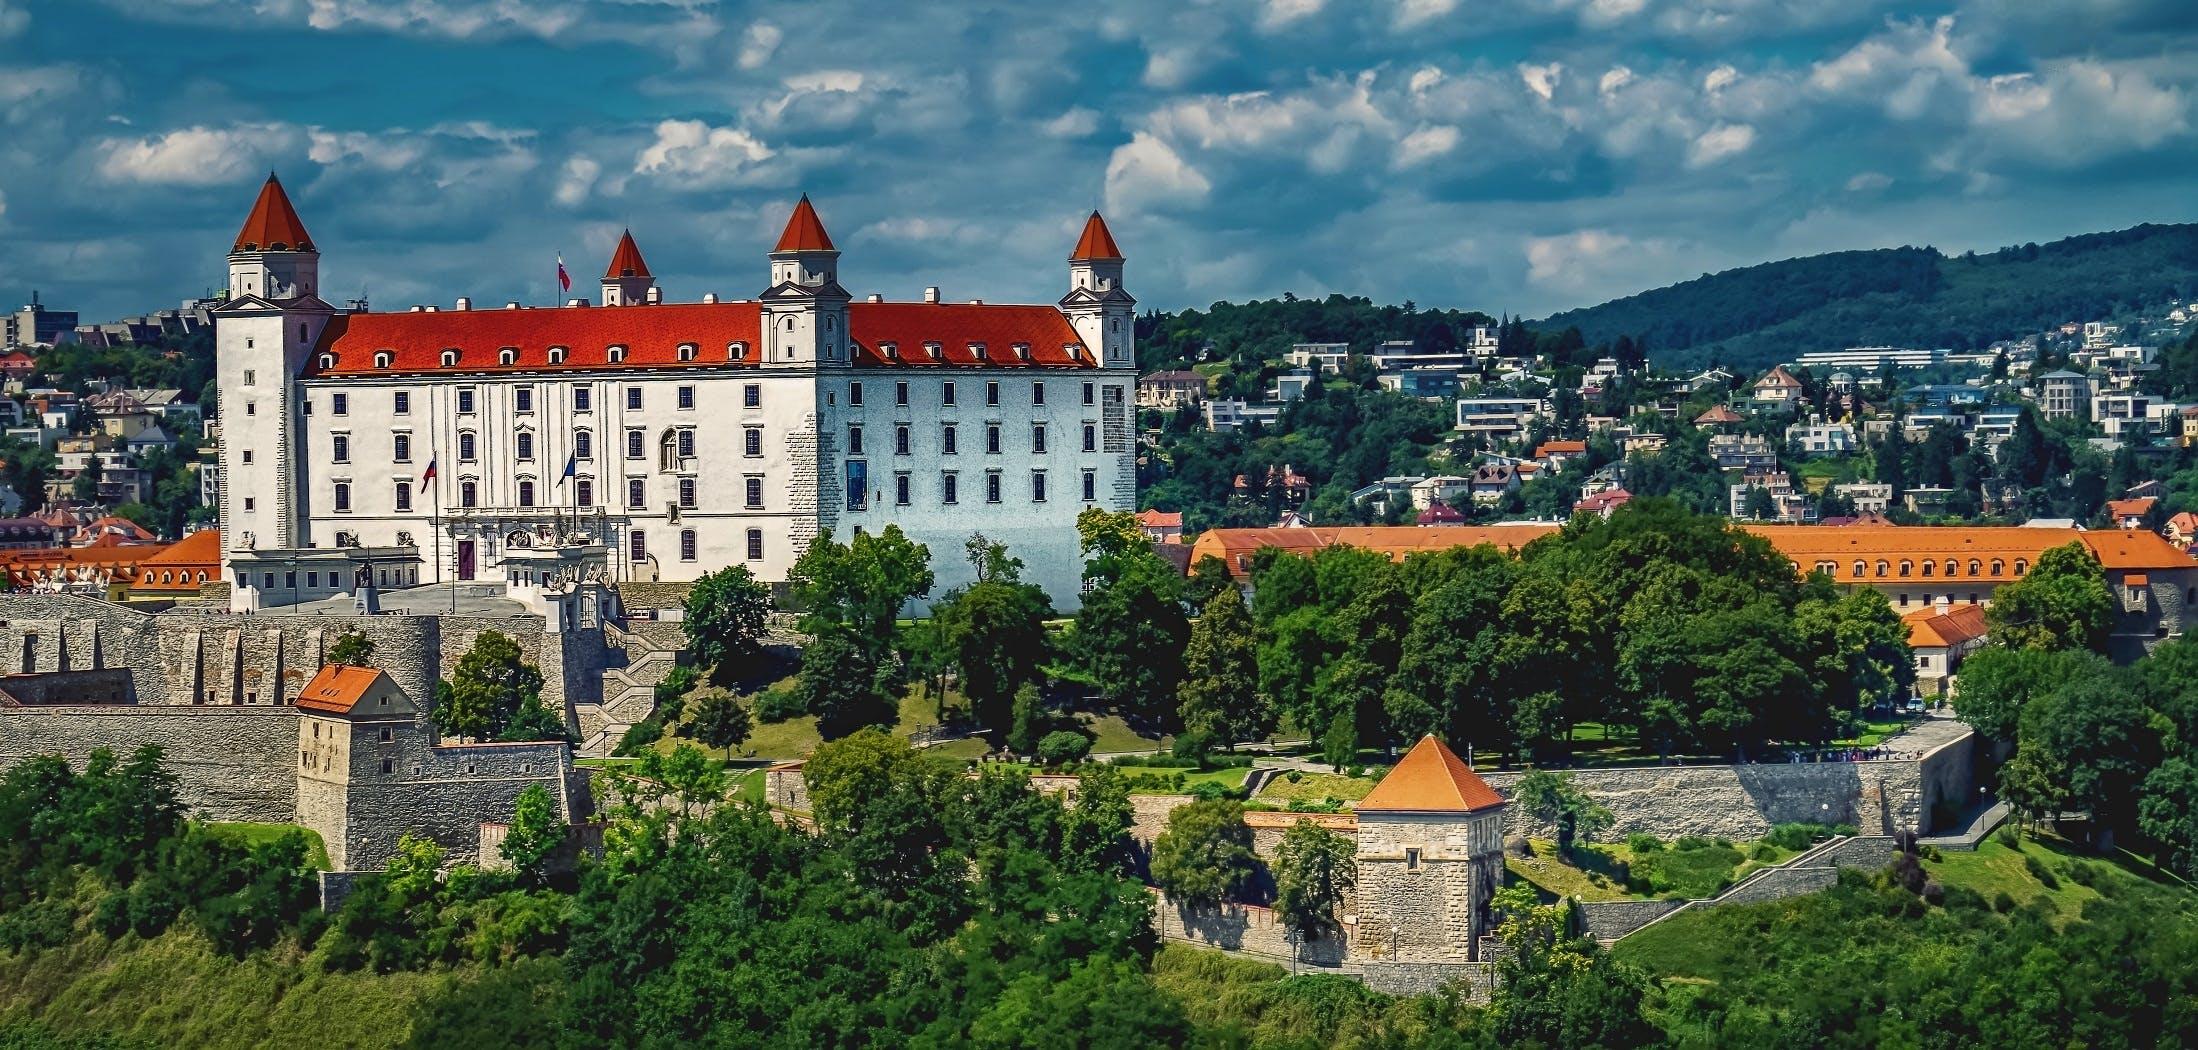 architecture, bratislava, bratislava castle